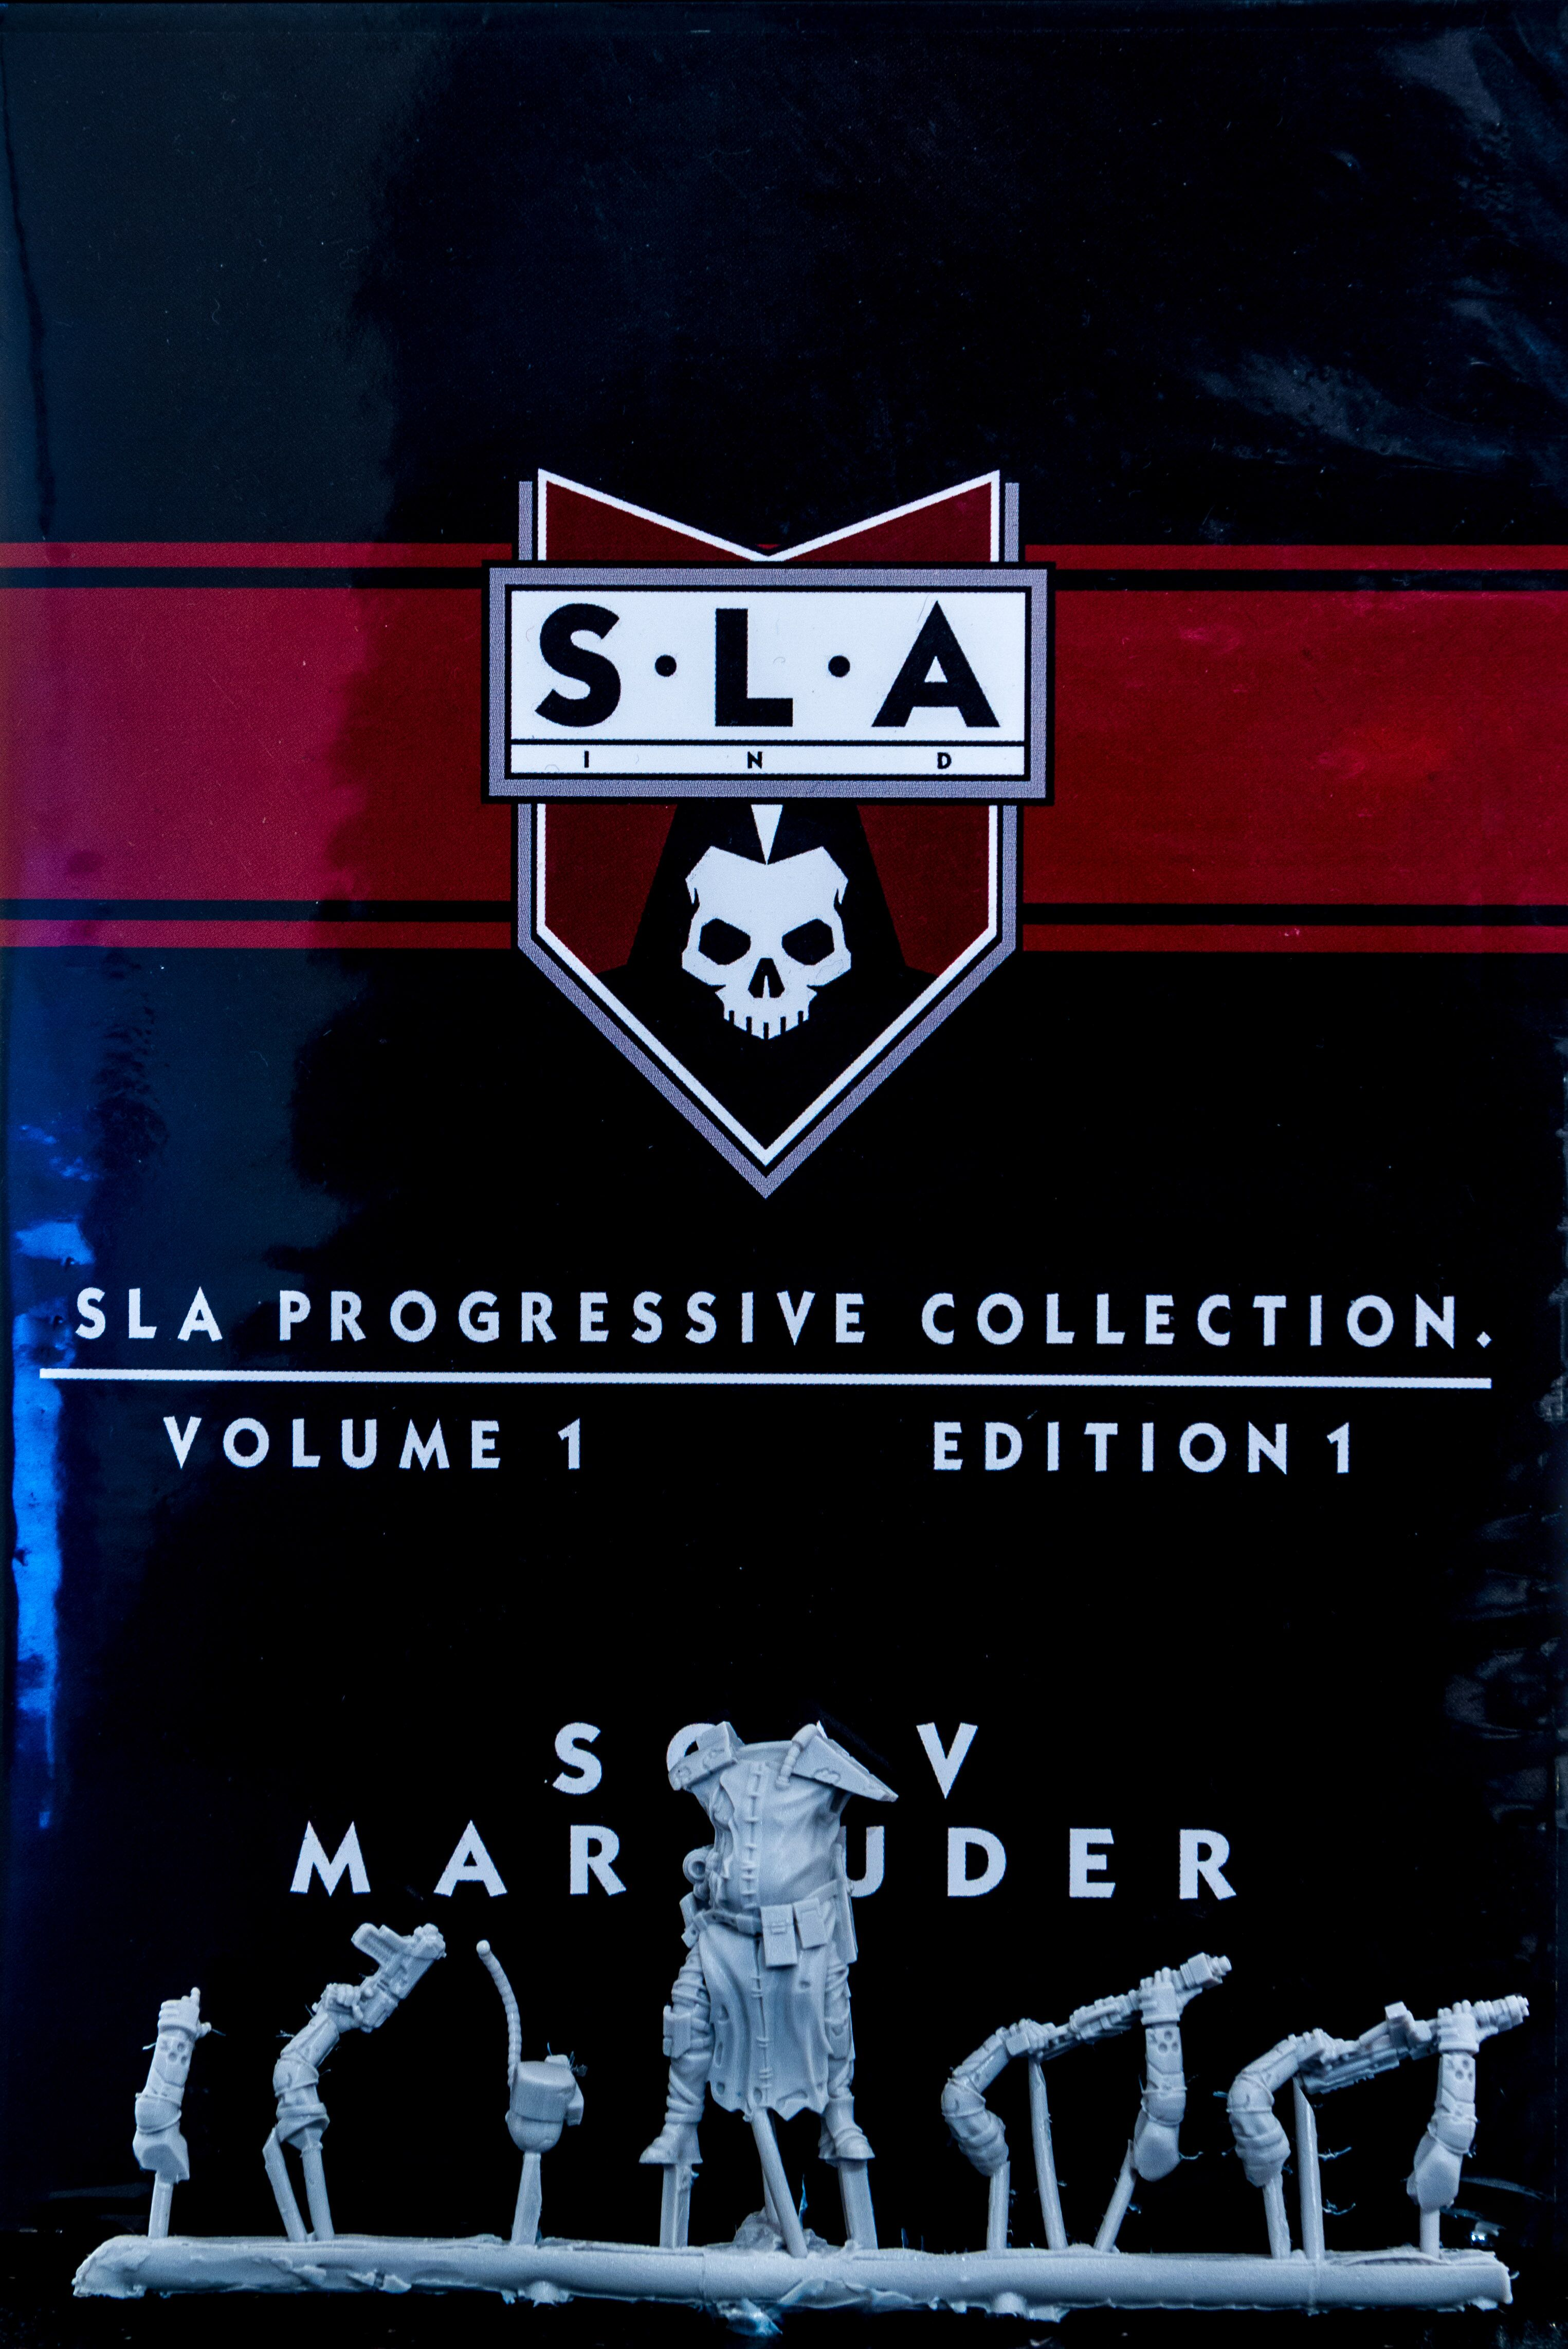 SLA Progressive Collection – Scav Marauder